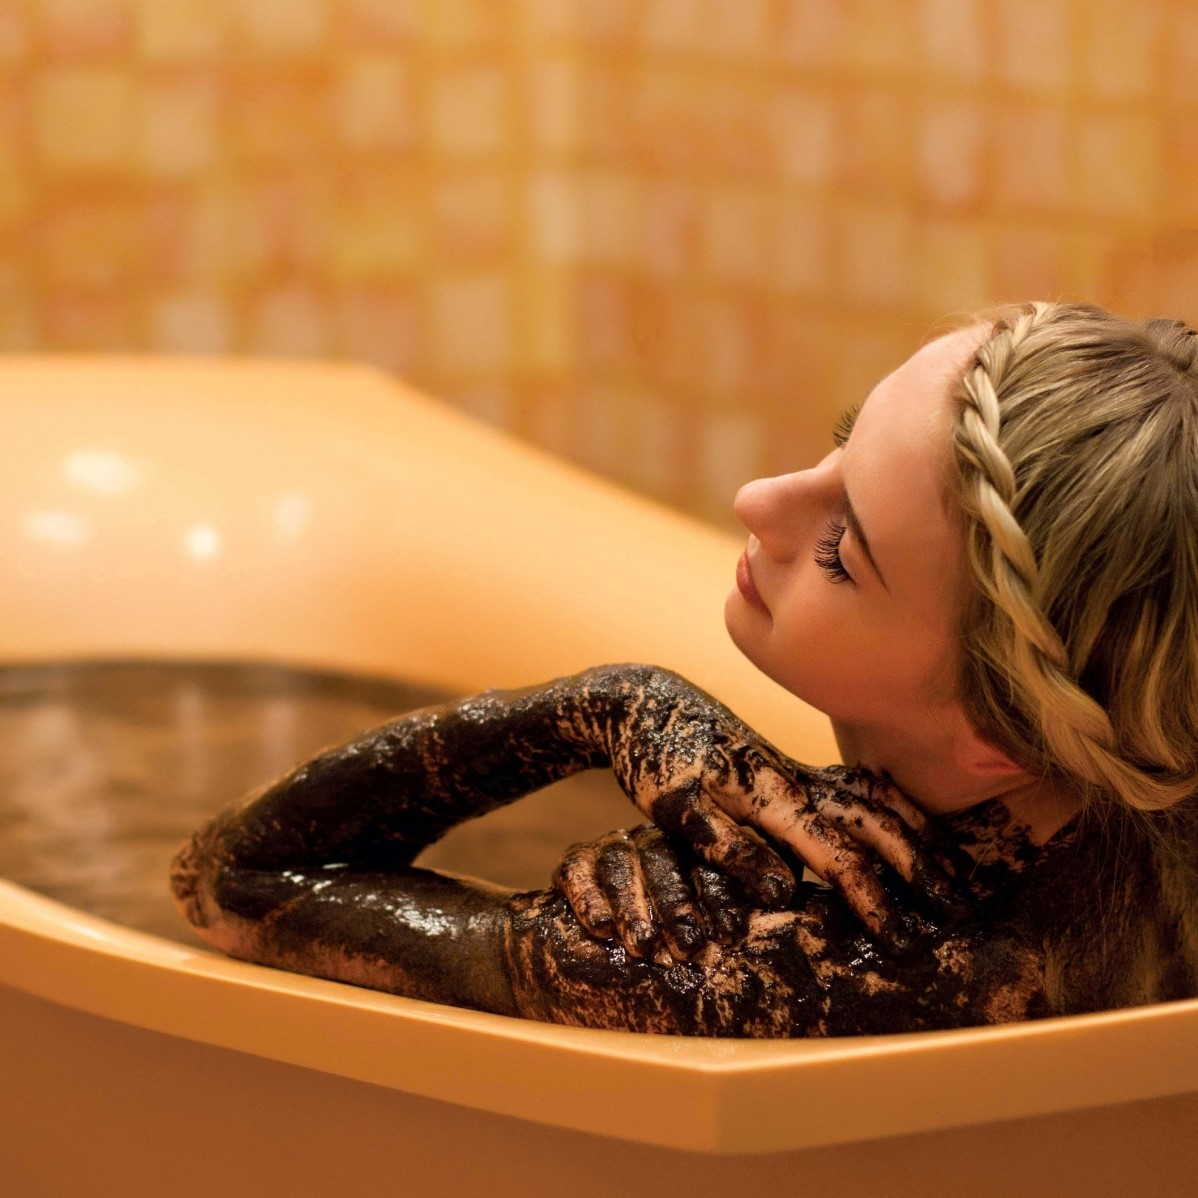 Rehabilitation and resort treatment